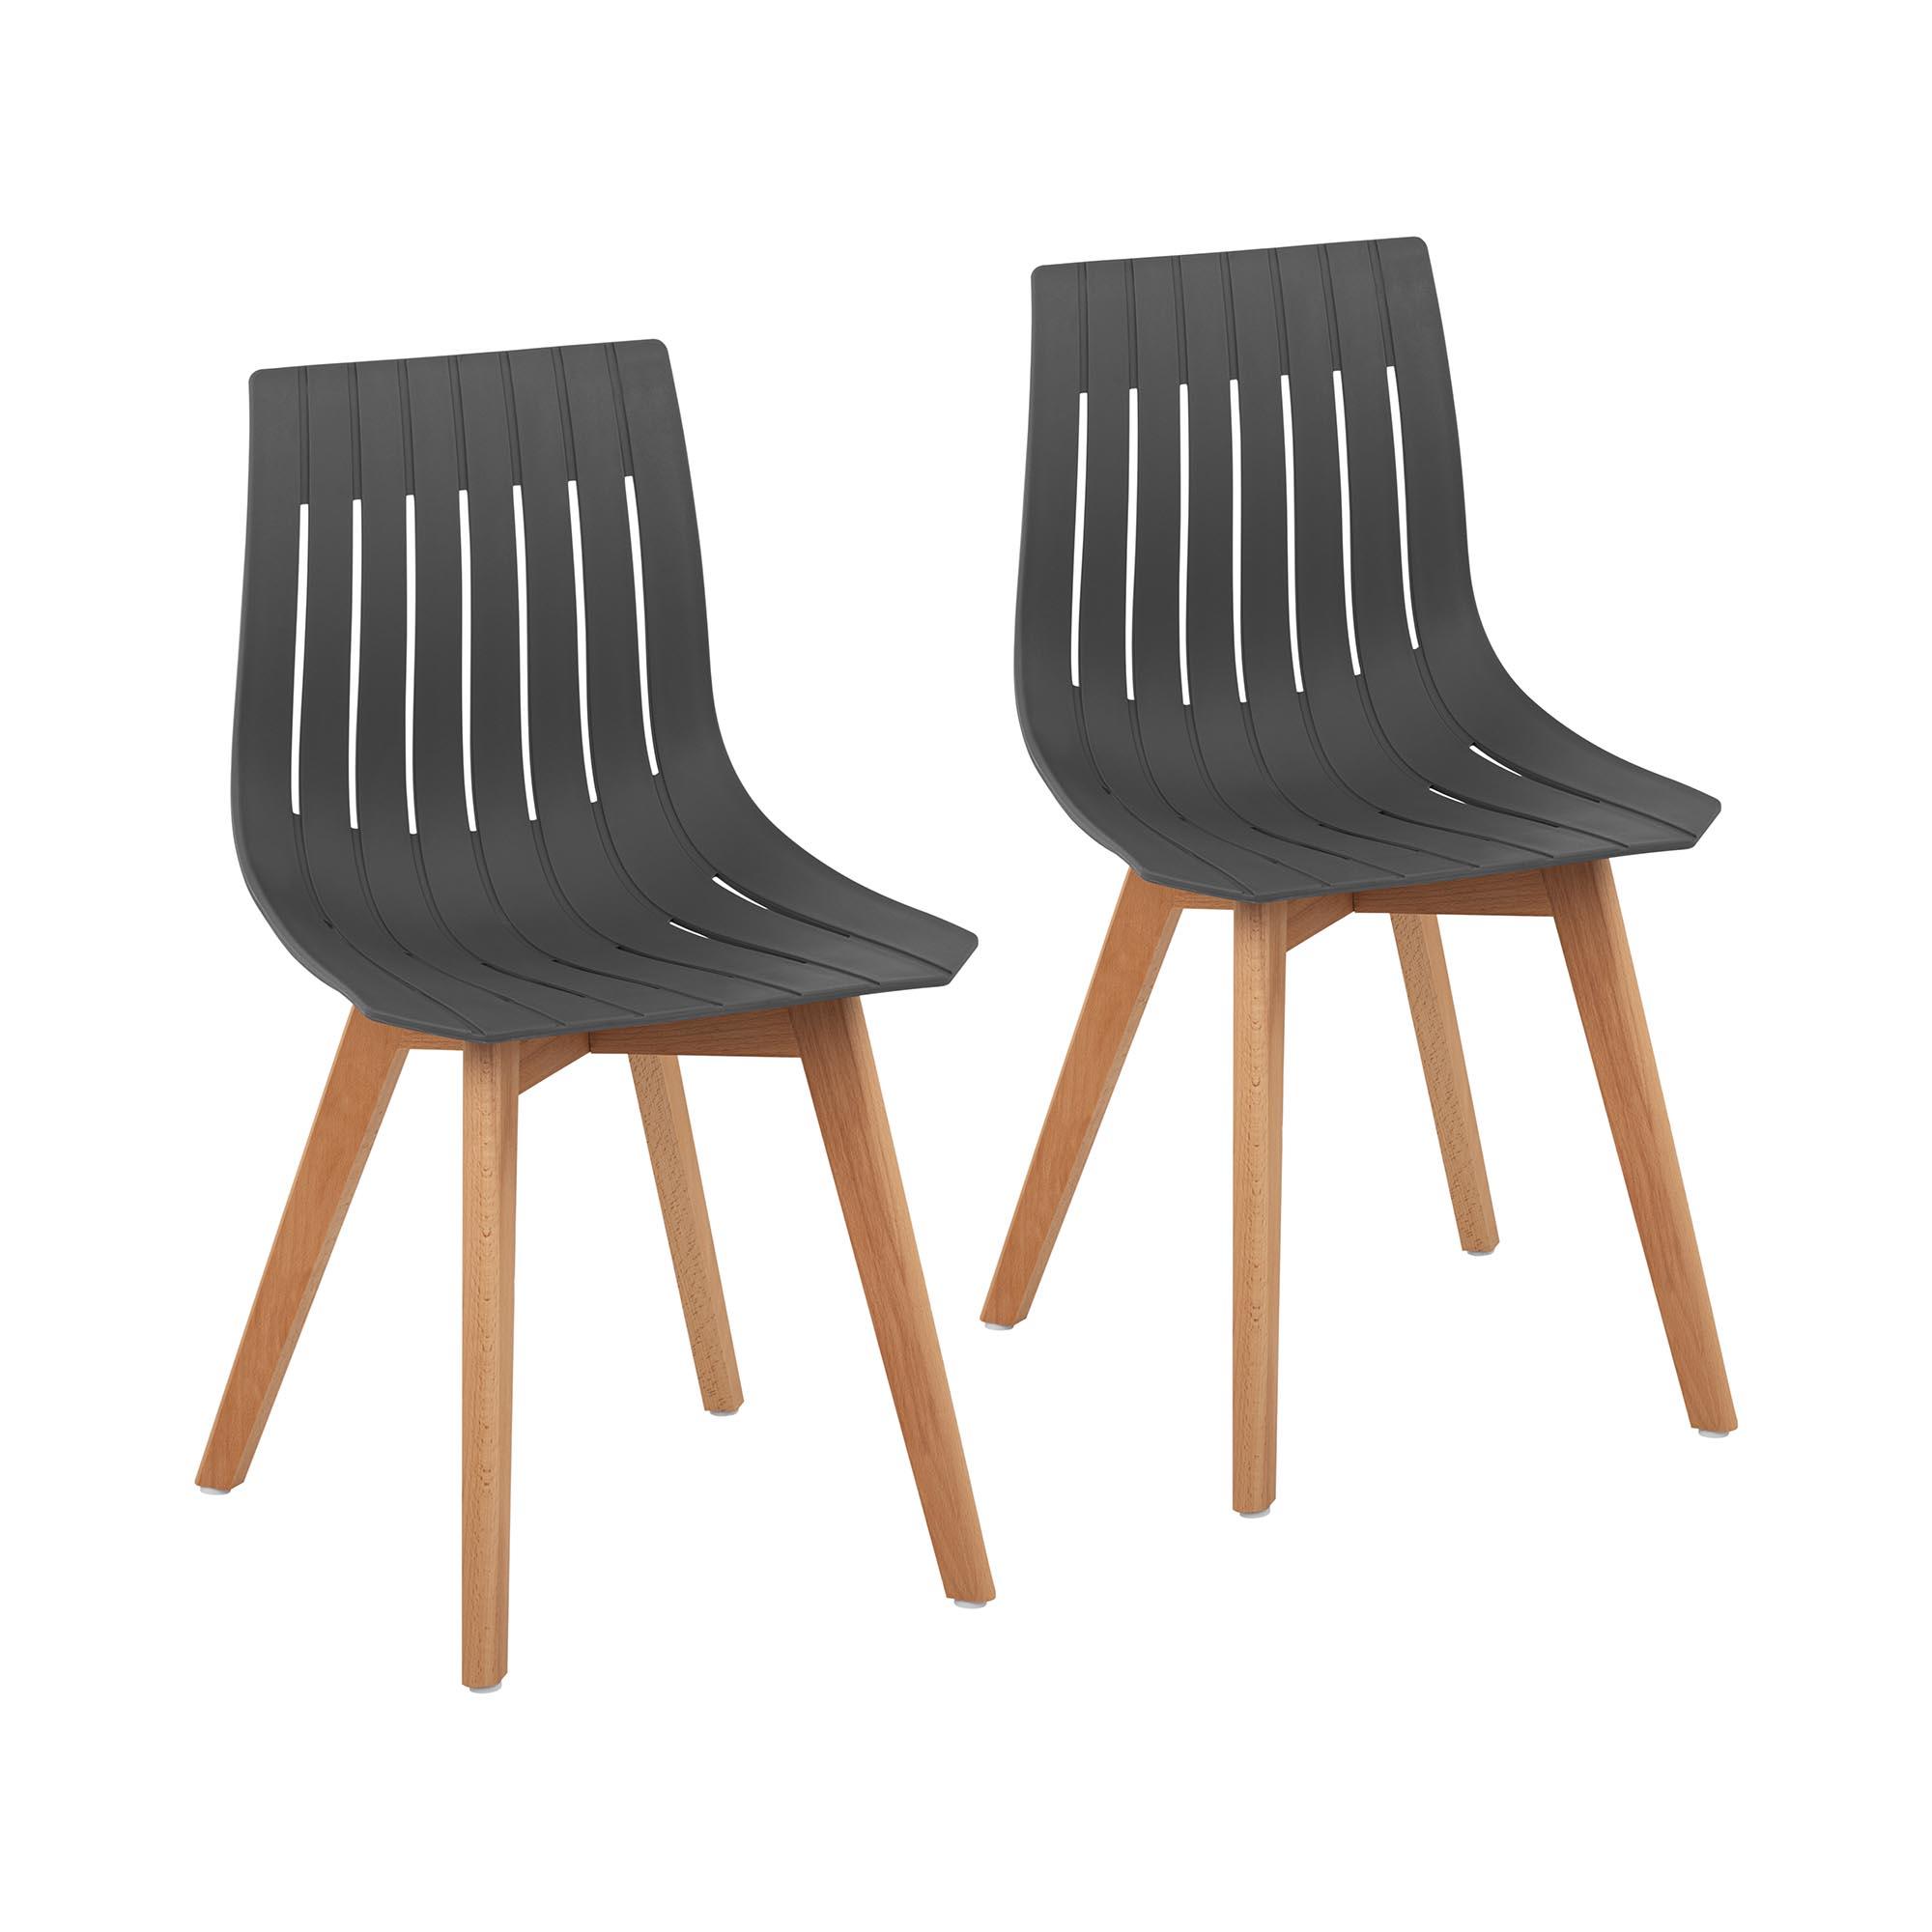 Fromm & Starck Stuhl - 2er Set - bis 150 kg - Sitzfläche 50 x 47 cm - grau STAR_SEAT_16